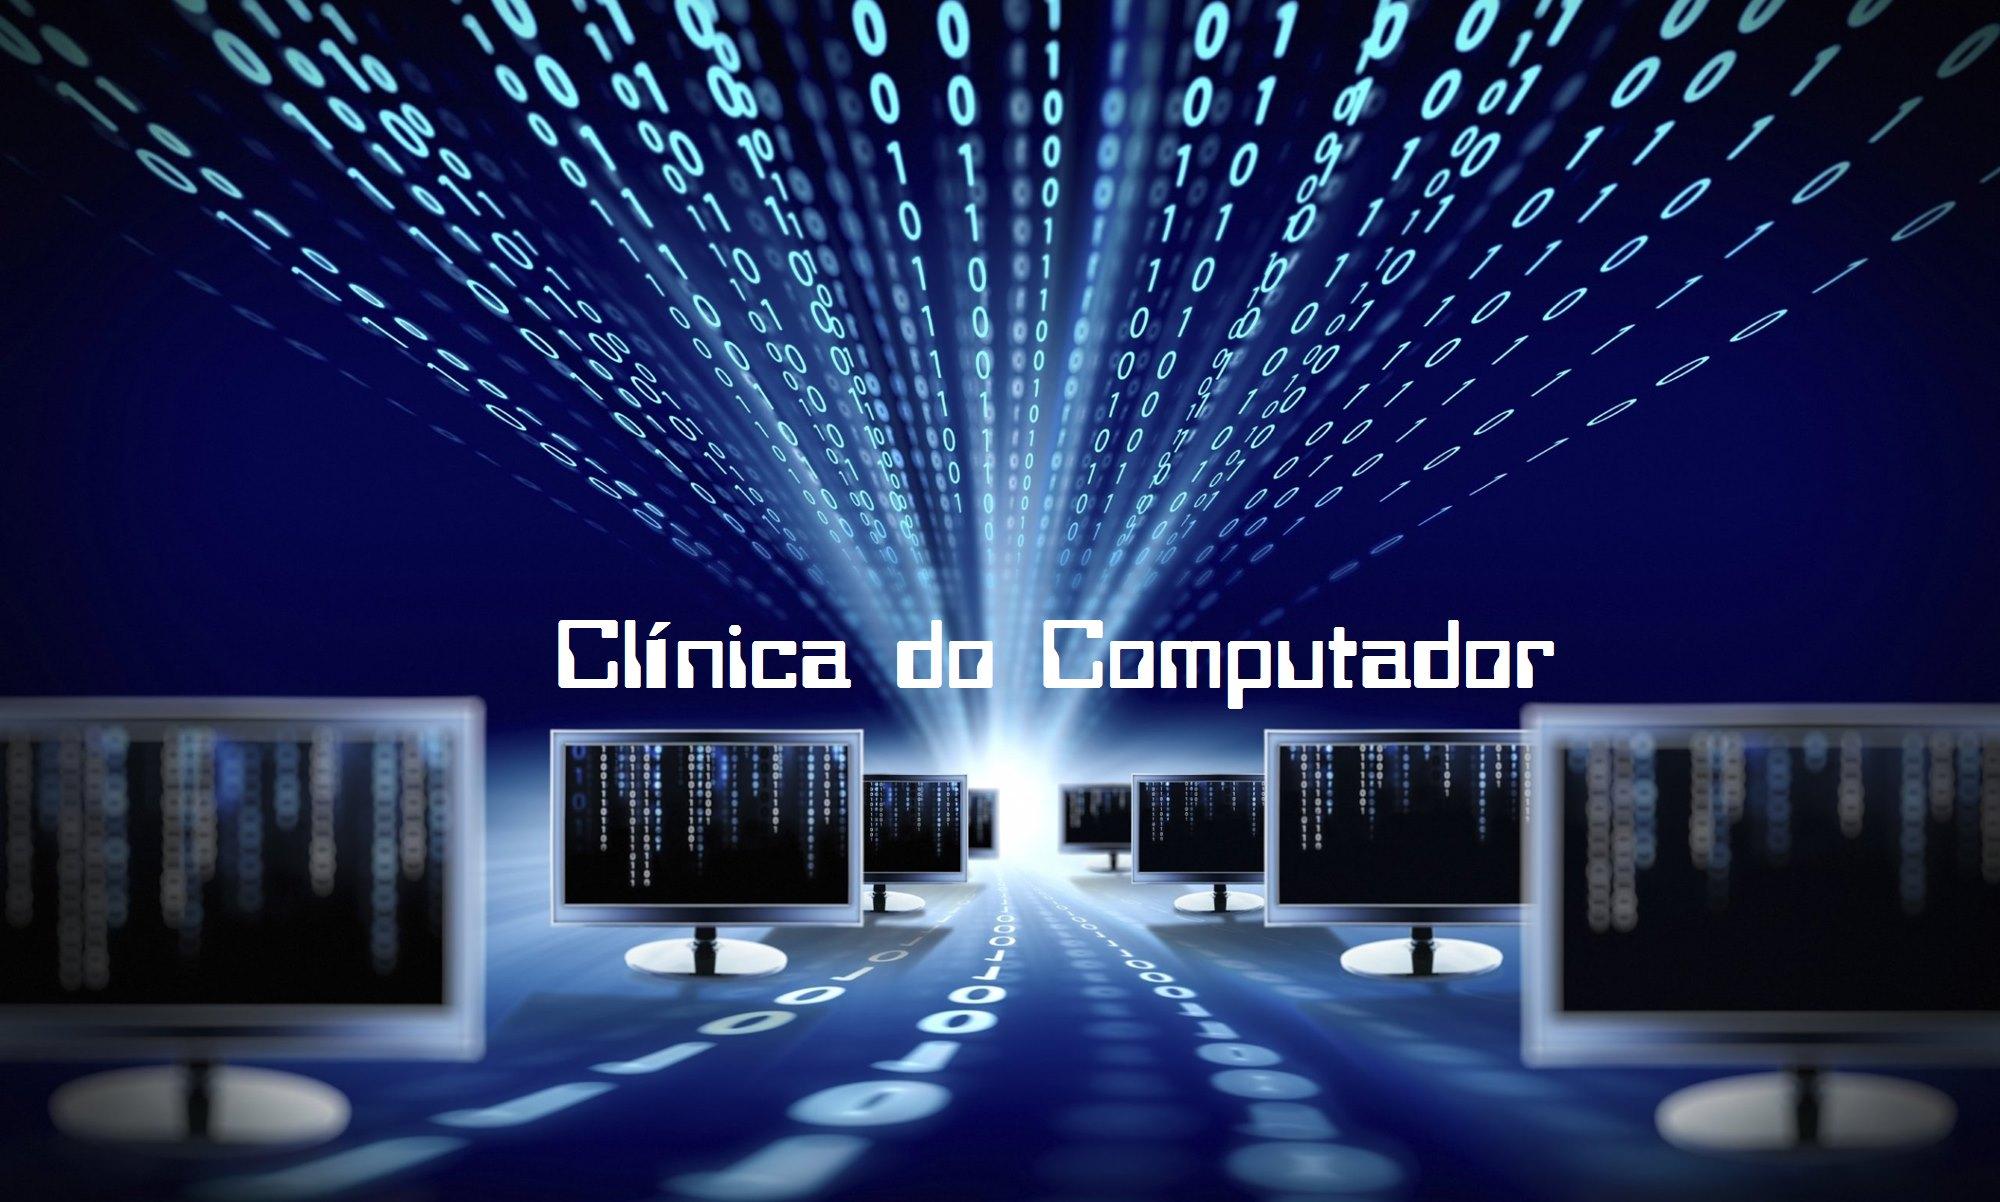 backgrounds-Computer-Wallpaper